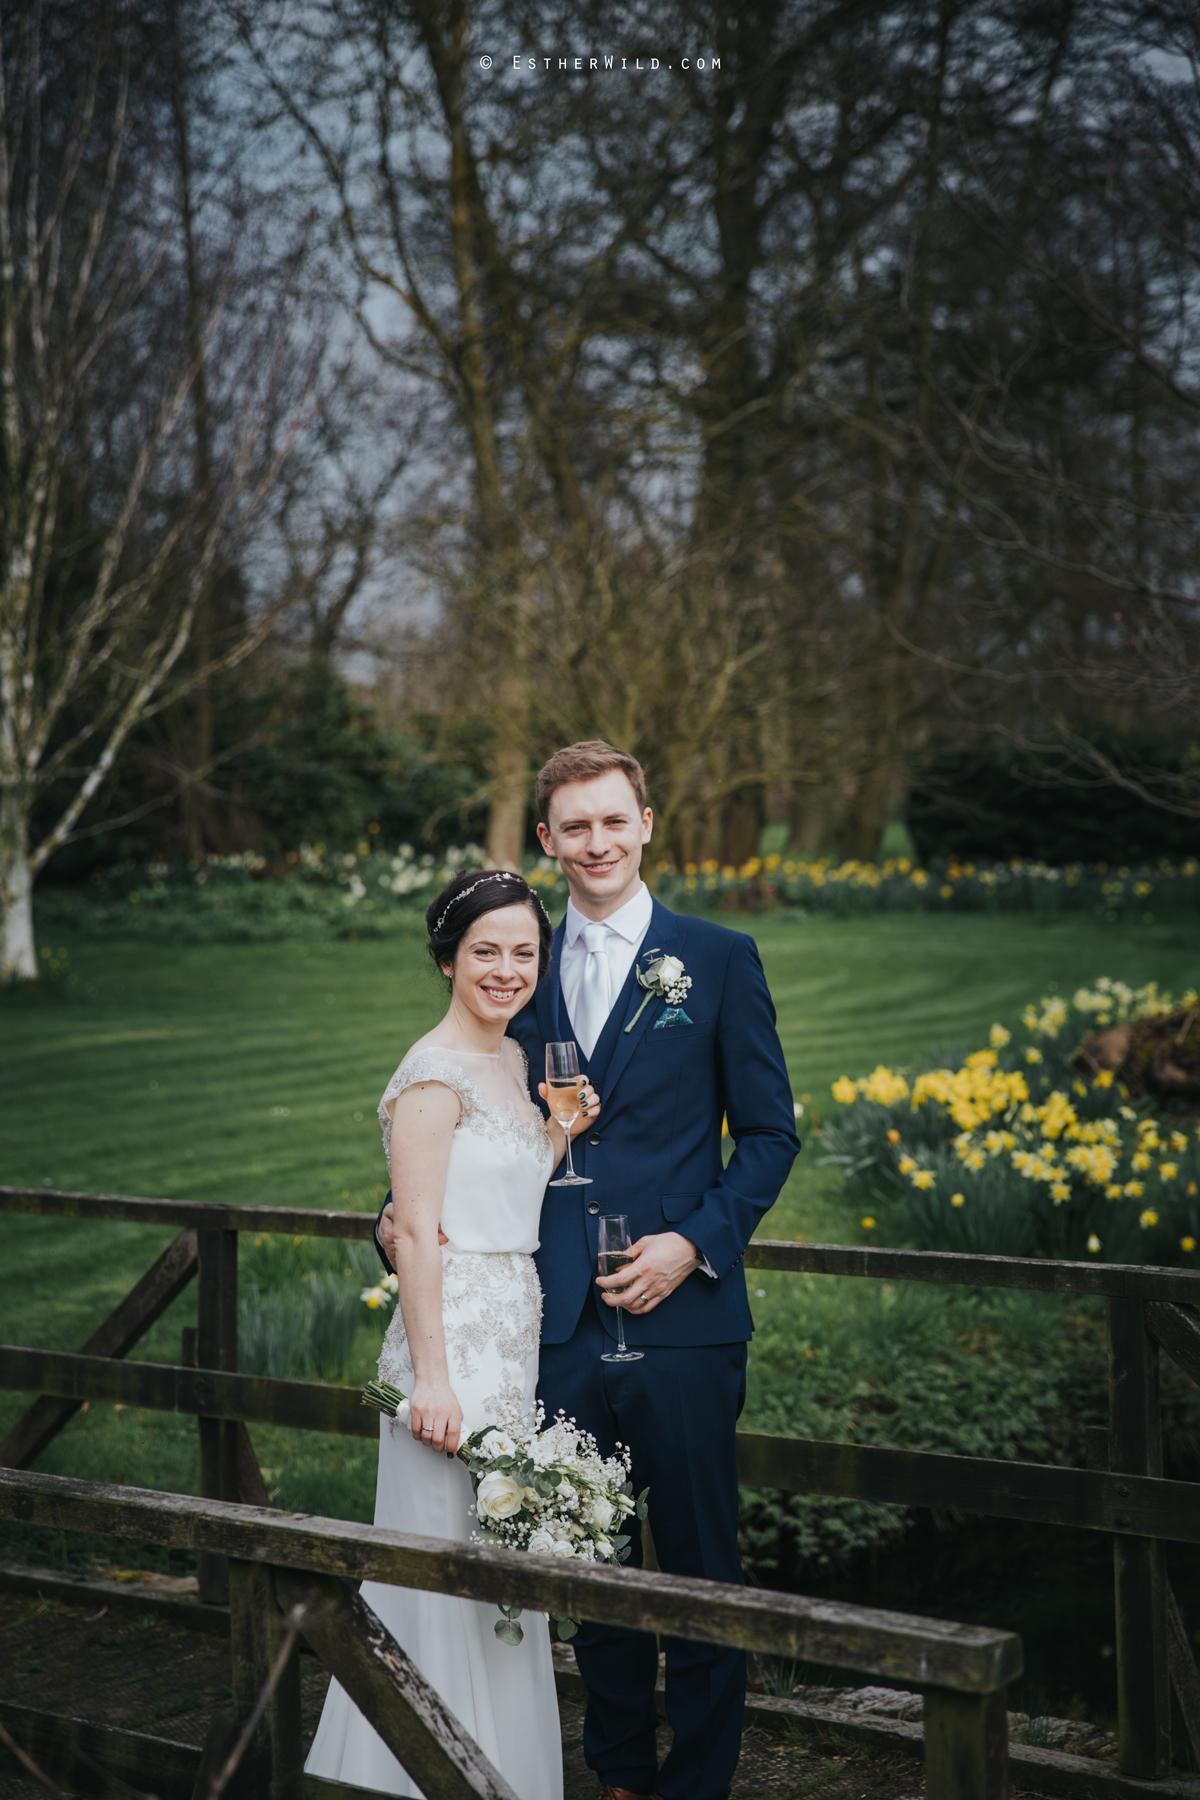 Norfolk_Mead_Hotel_Norwich_Wedding_Esther_Wild_Photographer_Copyright_IMG_1408.jpg